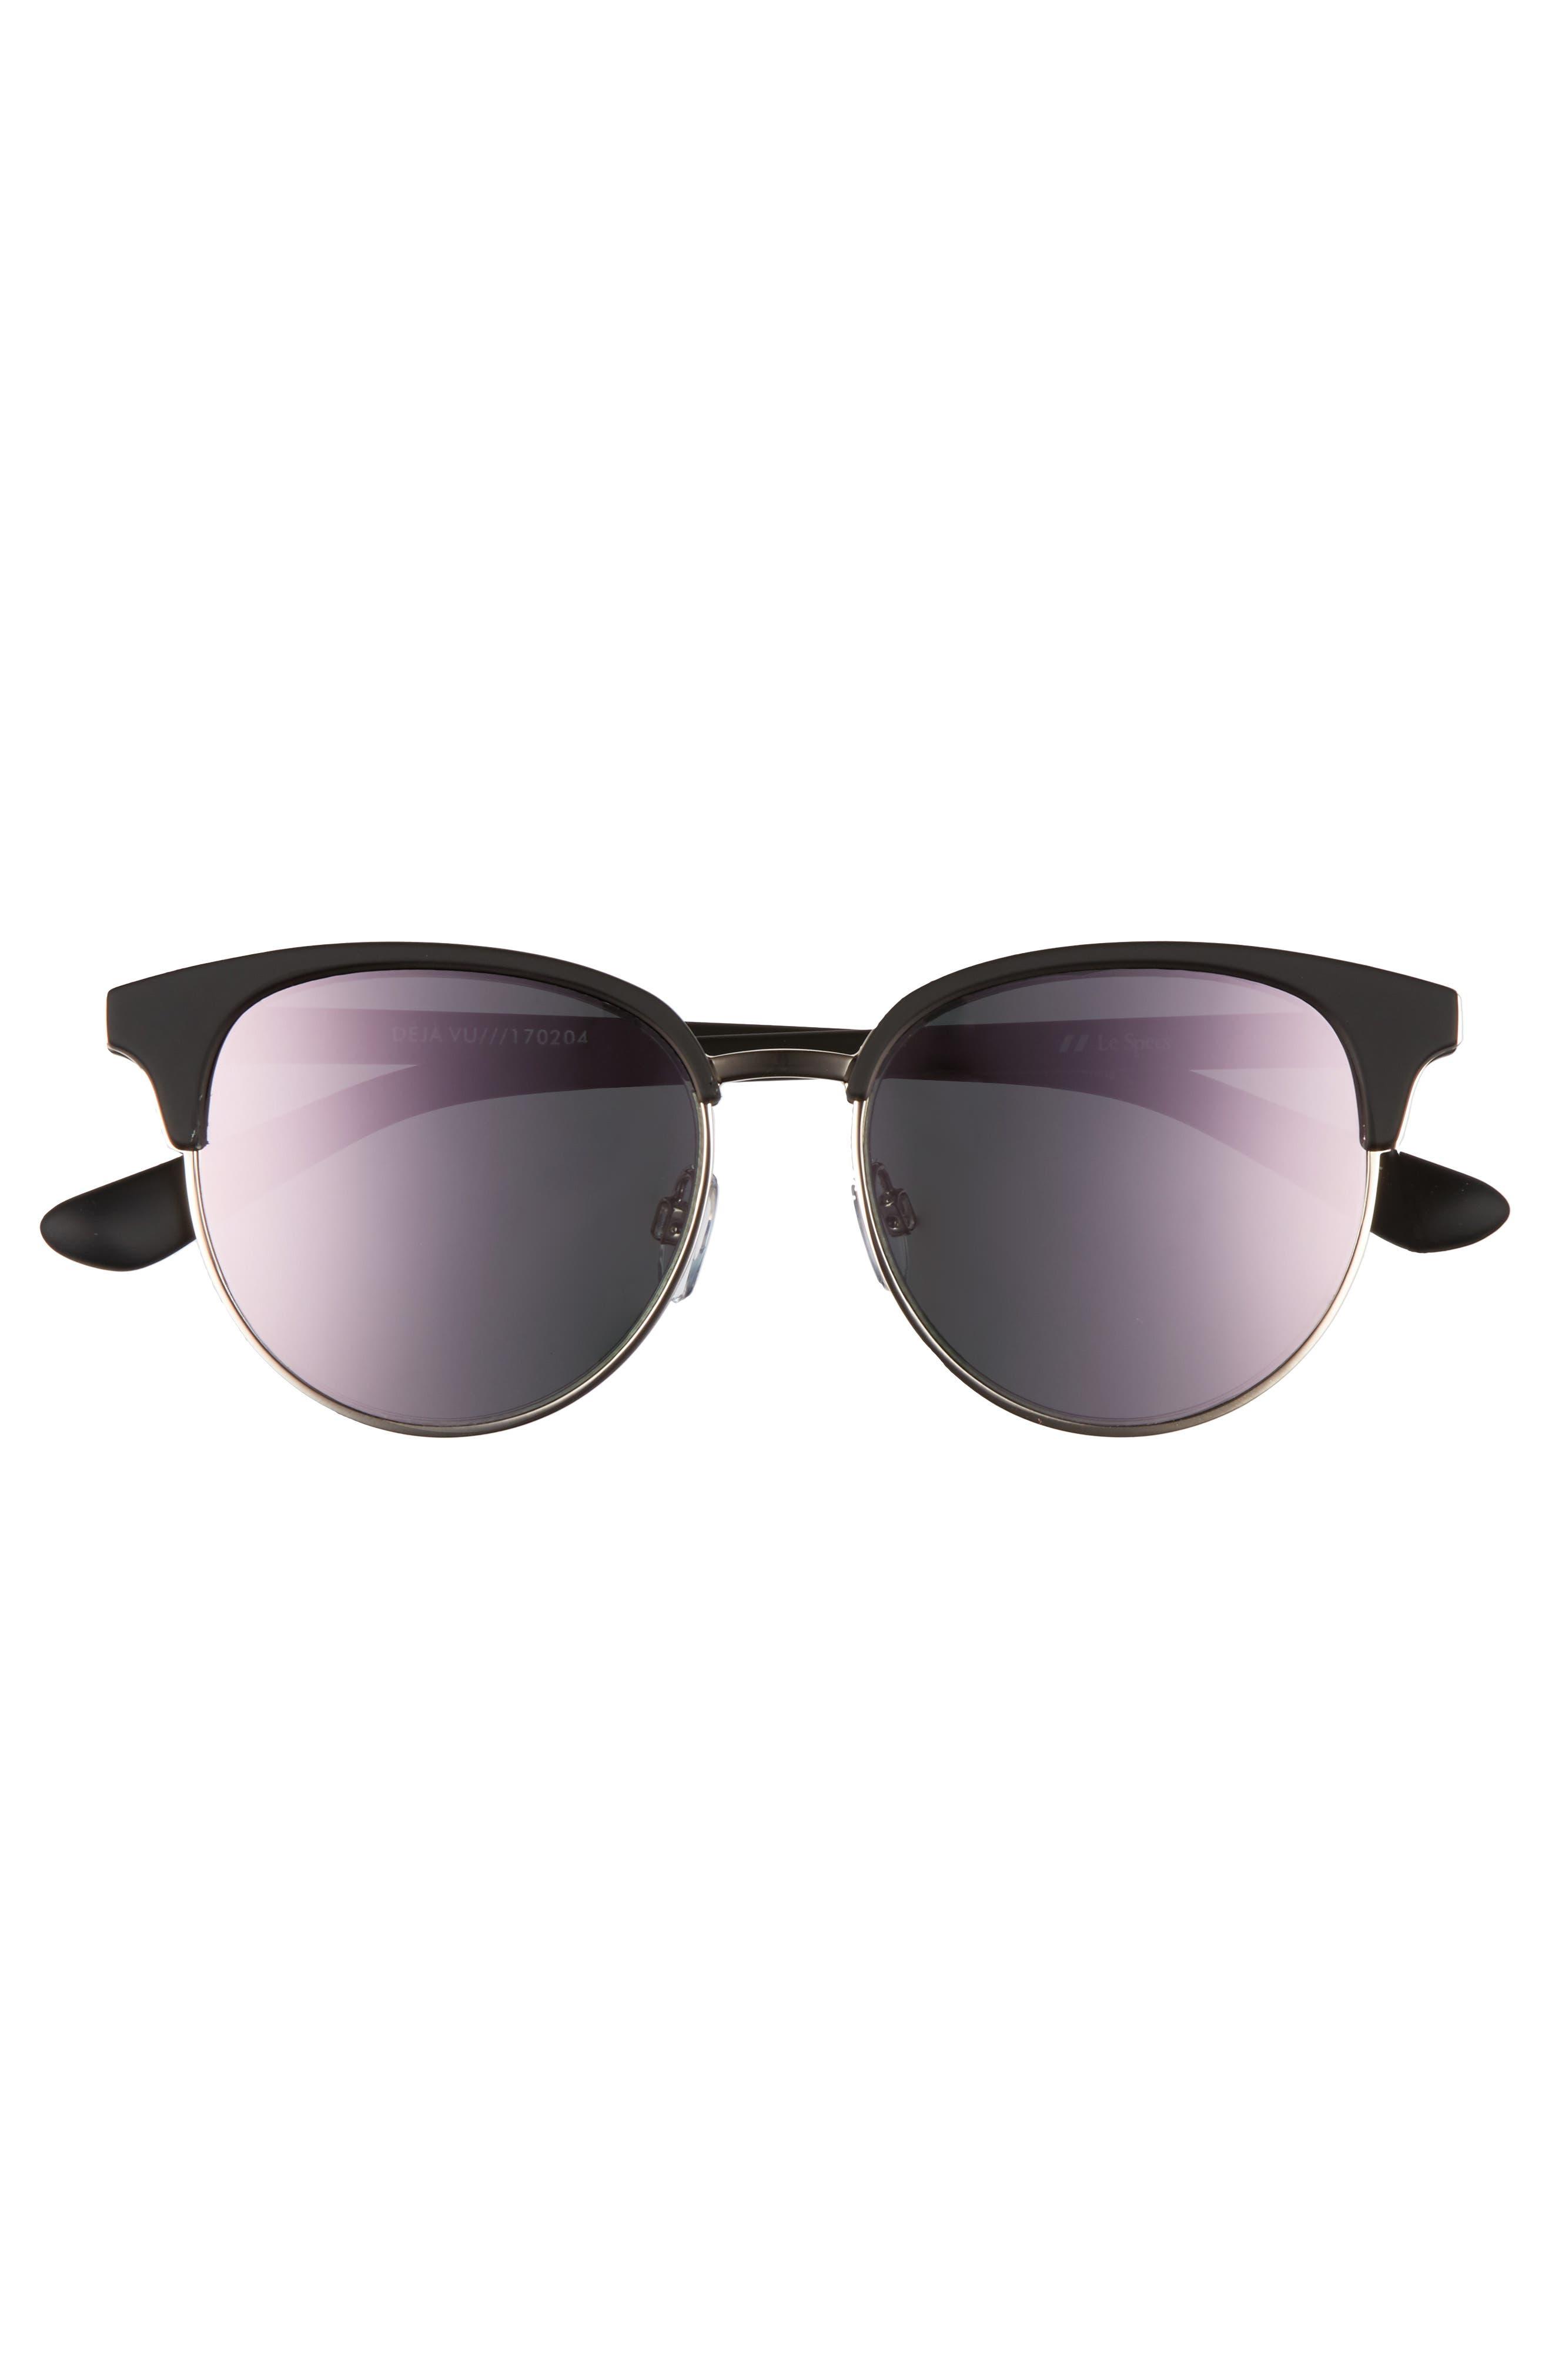 Deja Vu 51mm Round Sunglasses,                             Alternate thumbnail 3, color,                             001